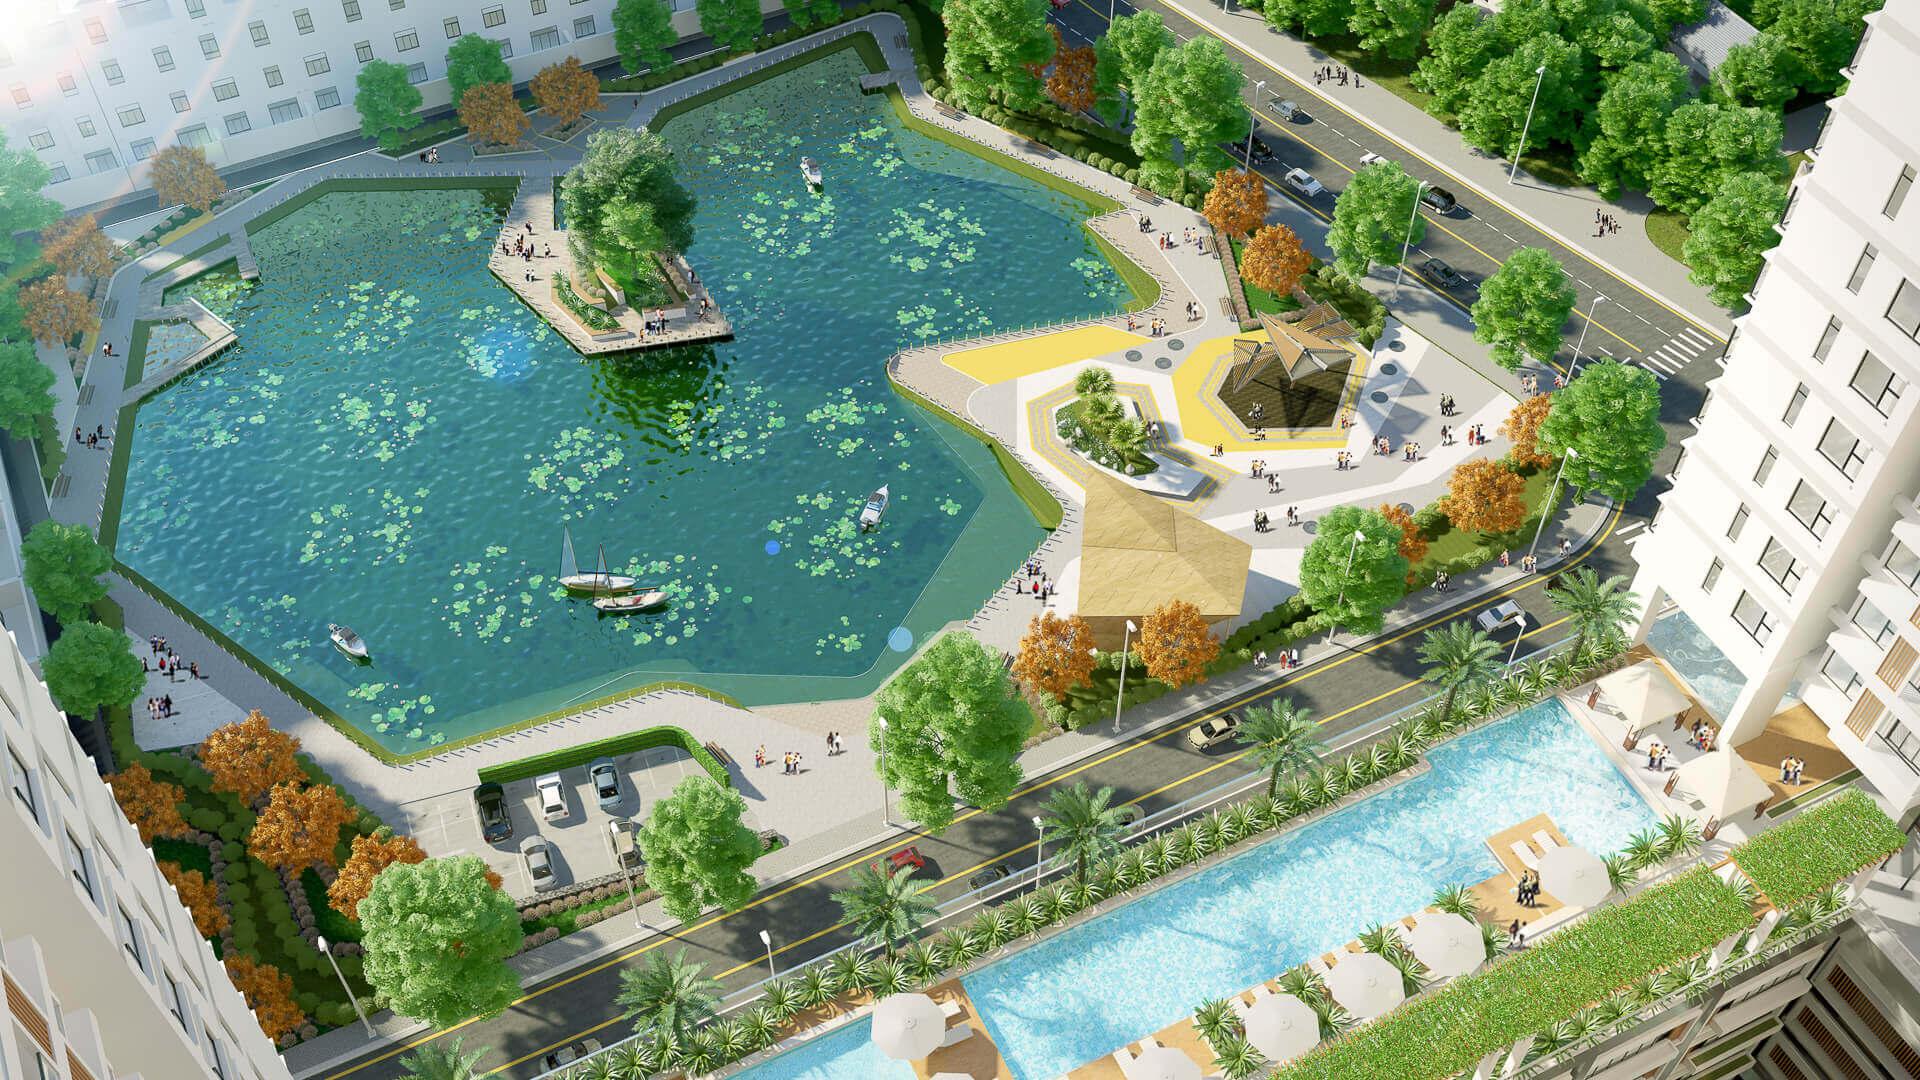 công viên luna park tại the peak garden quận 7